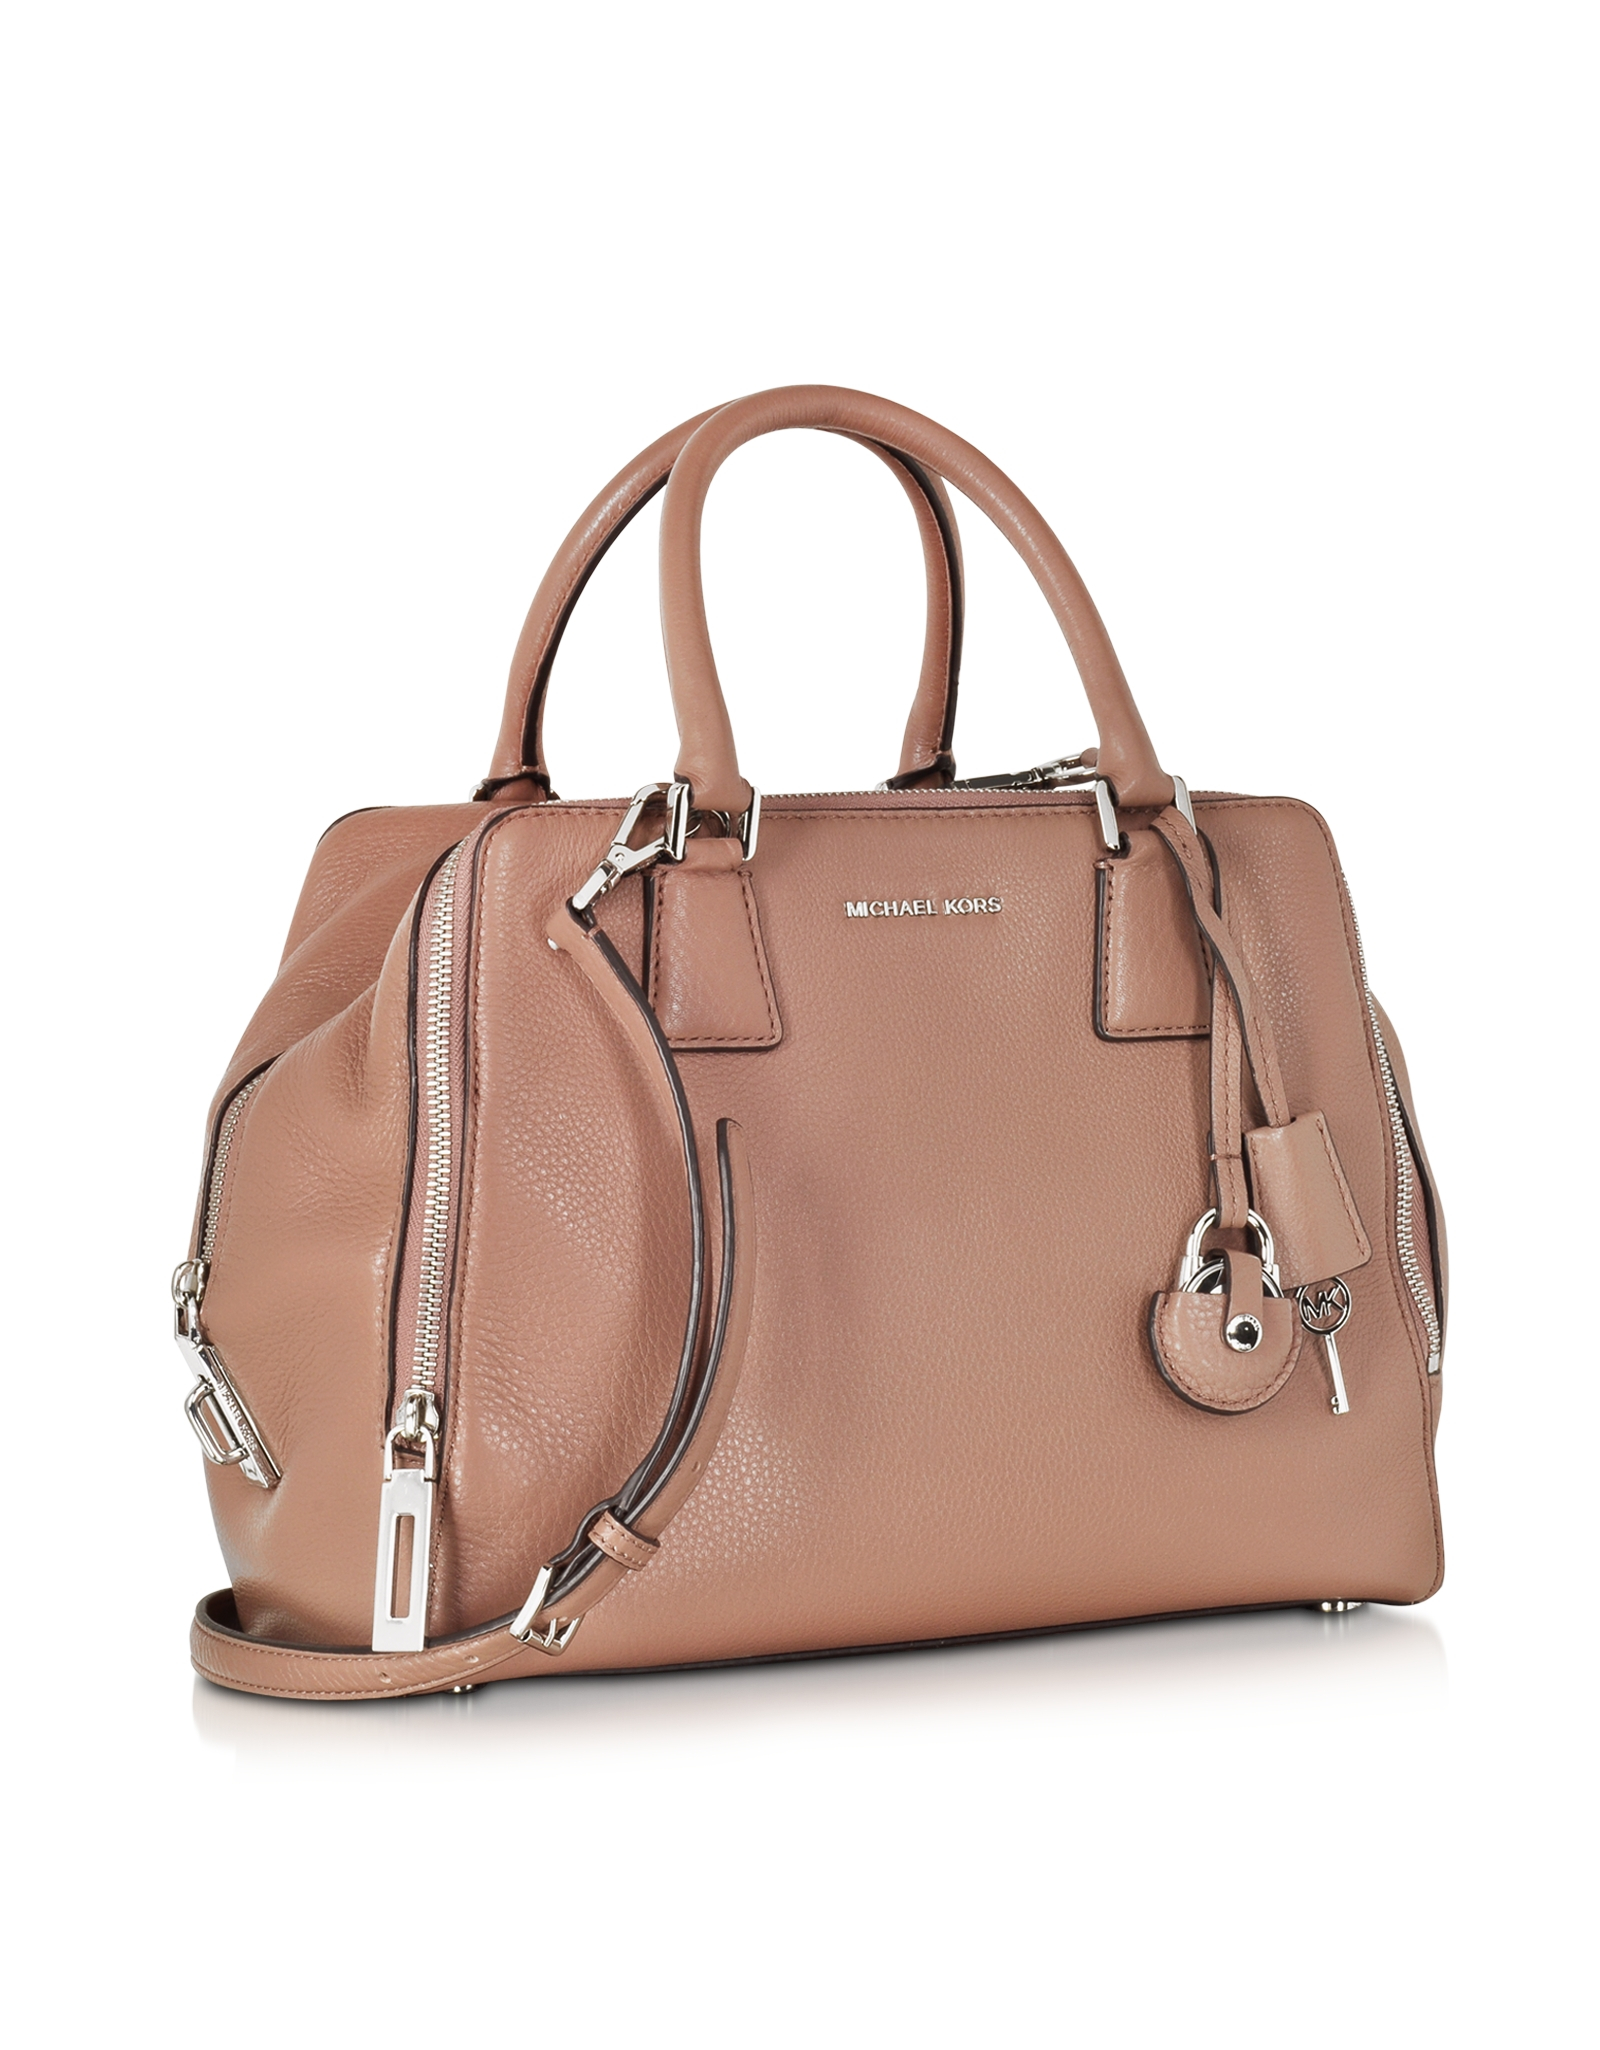 Michael kors Zoey Large Pebble Leather Satchel Bag in ...